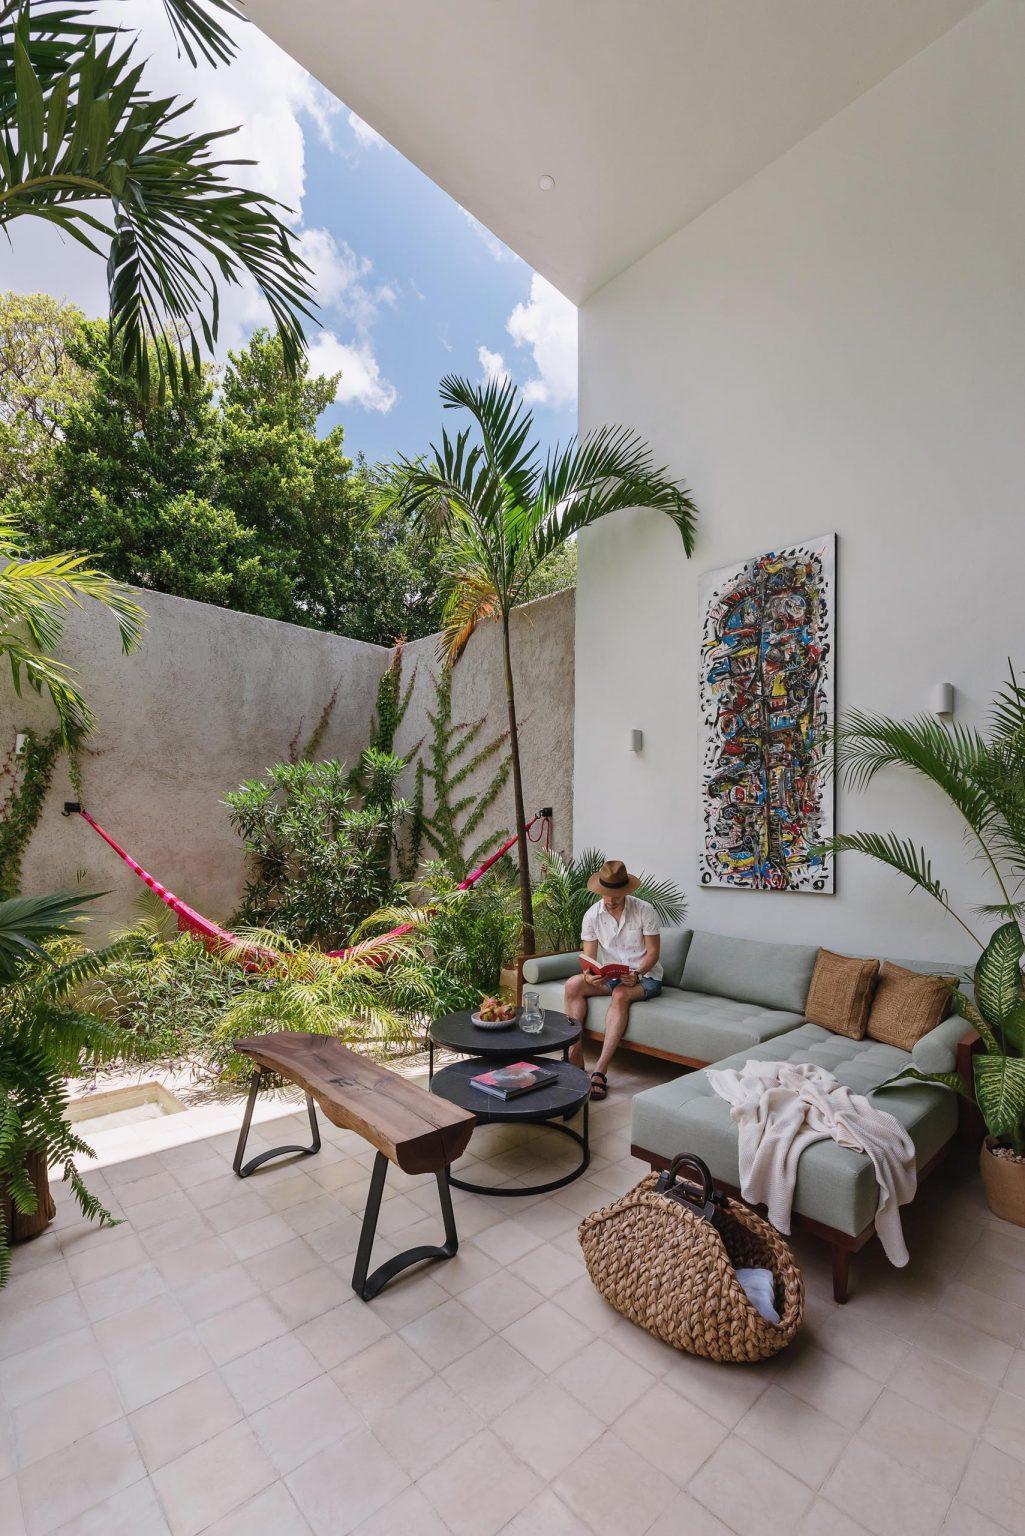 patio de relax